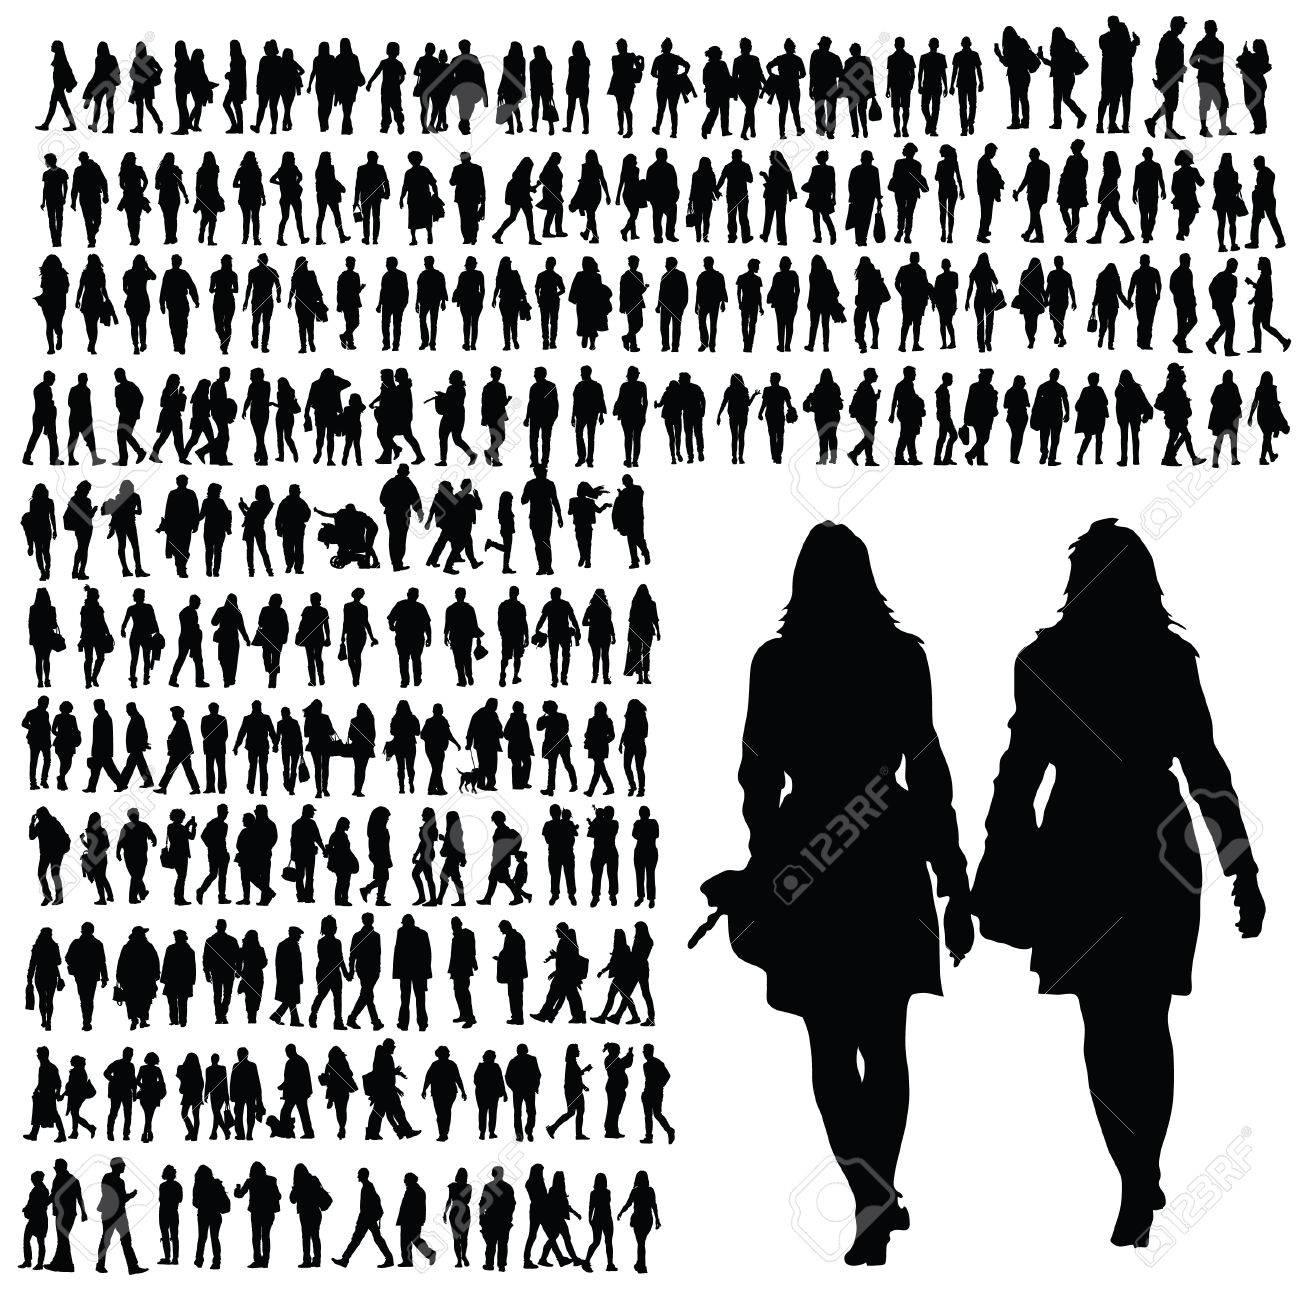 People Walking Silhouette Black Illustration On White Stock Vector